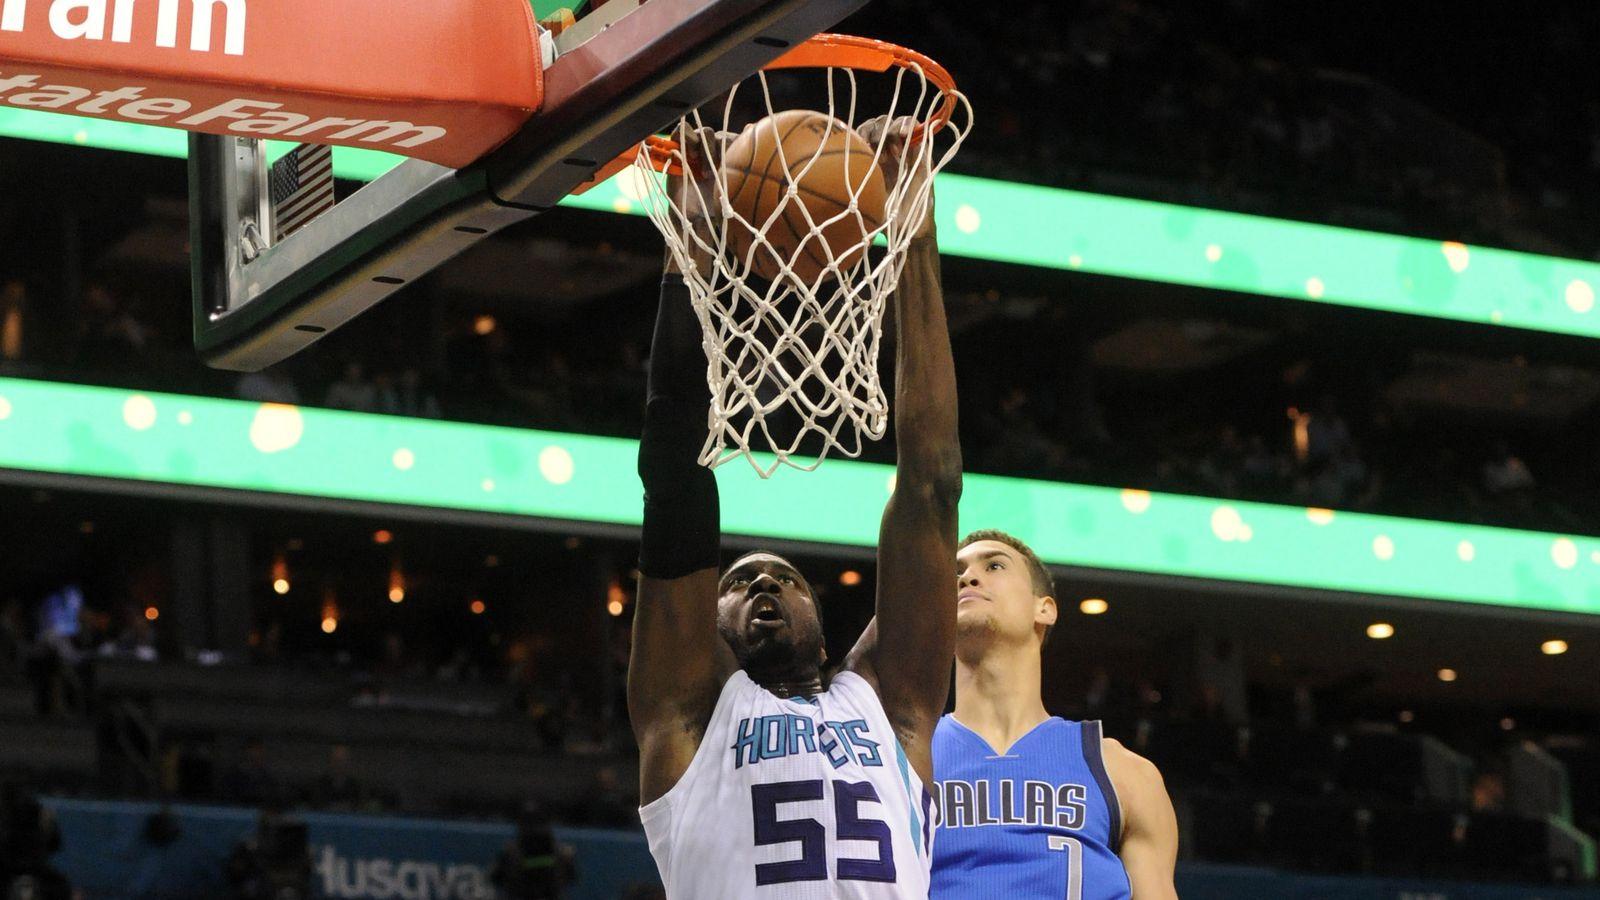 прогноз на матч НБА - Даллас Маверикс - Шарлотт Хорнетс